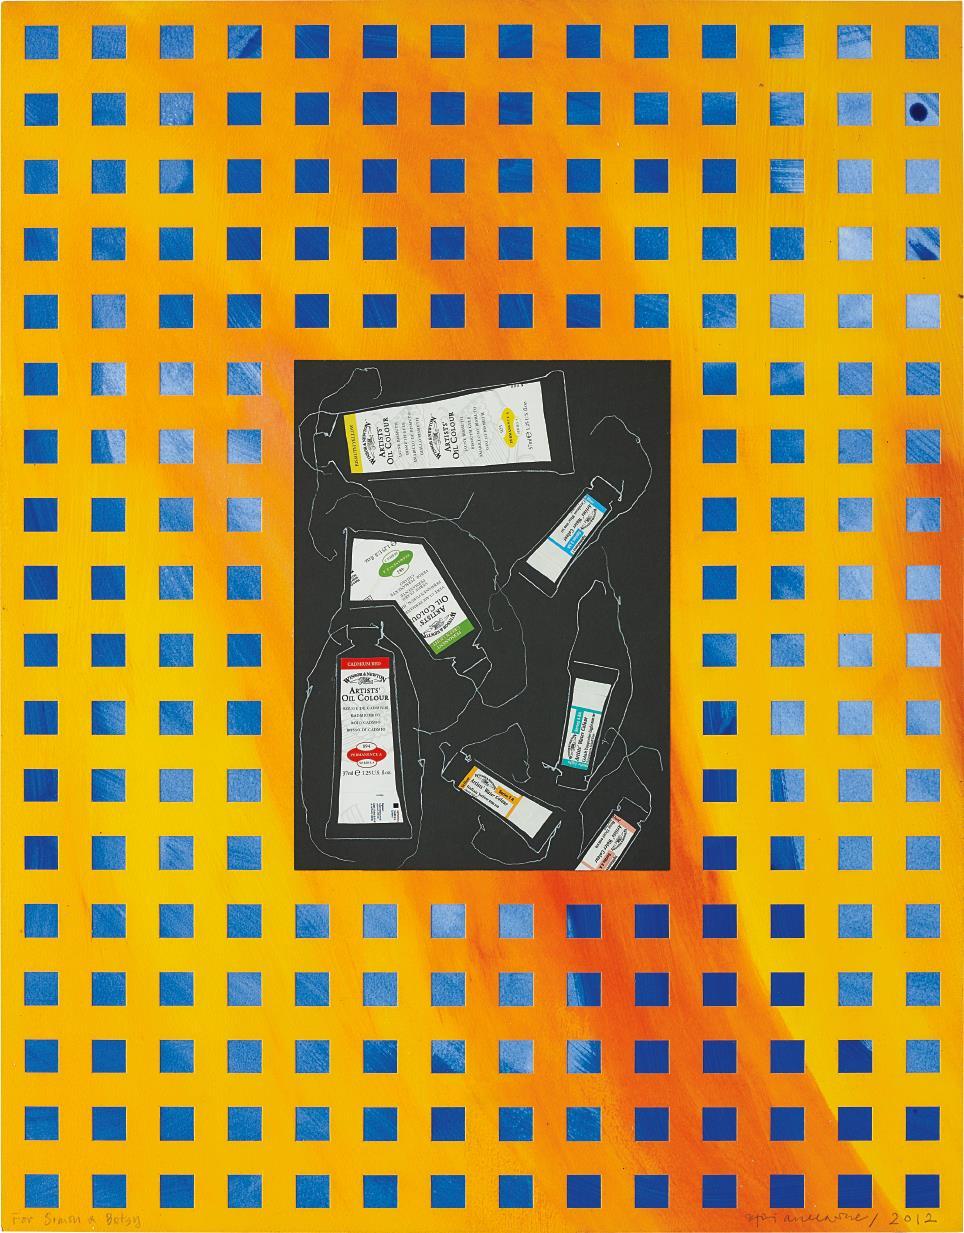 Brian Clarke-Untitled-2012